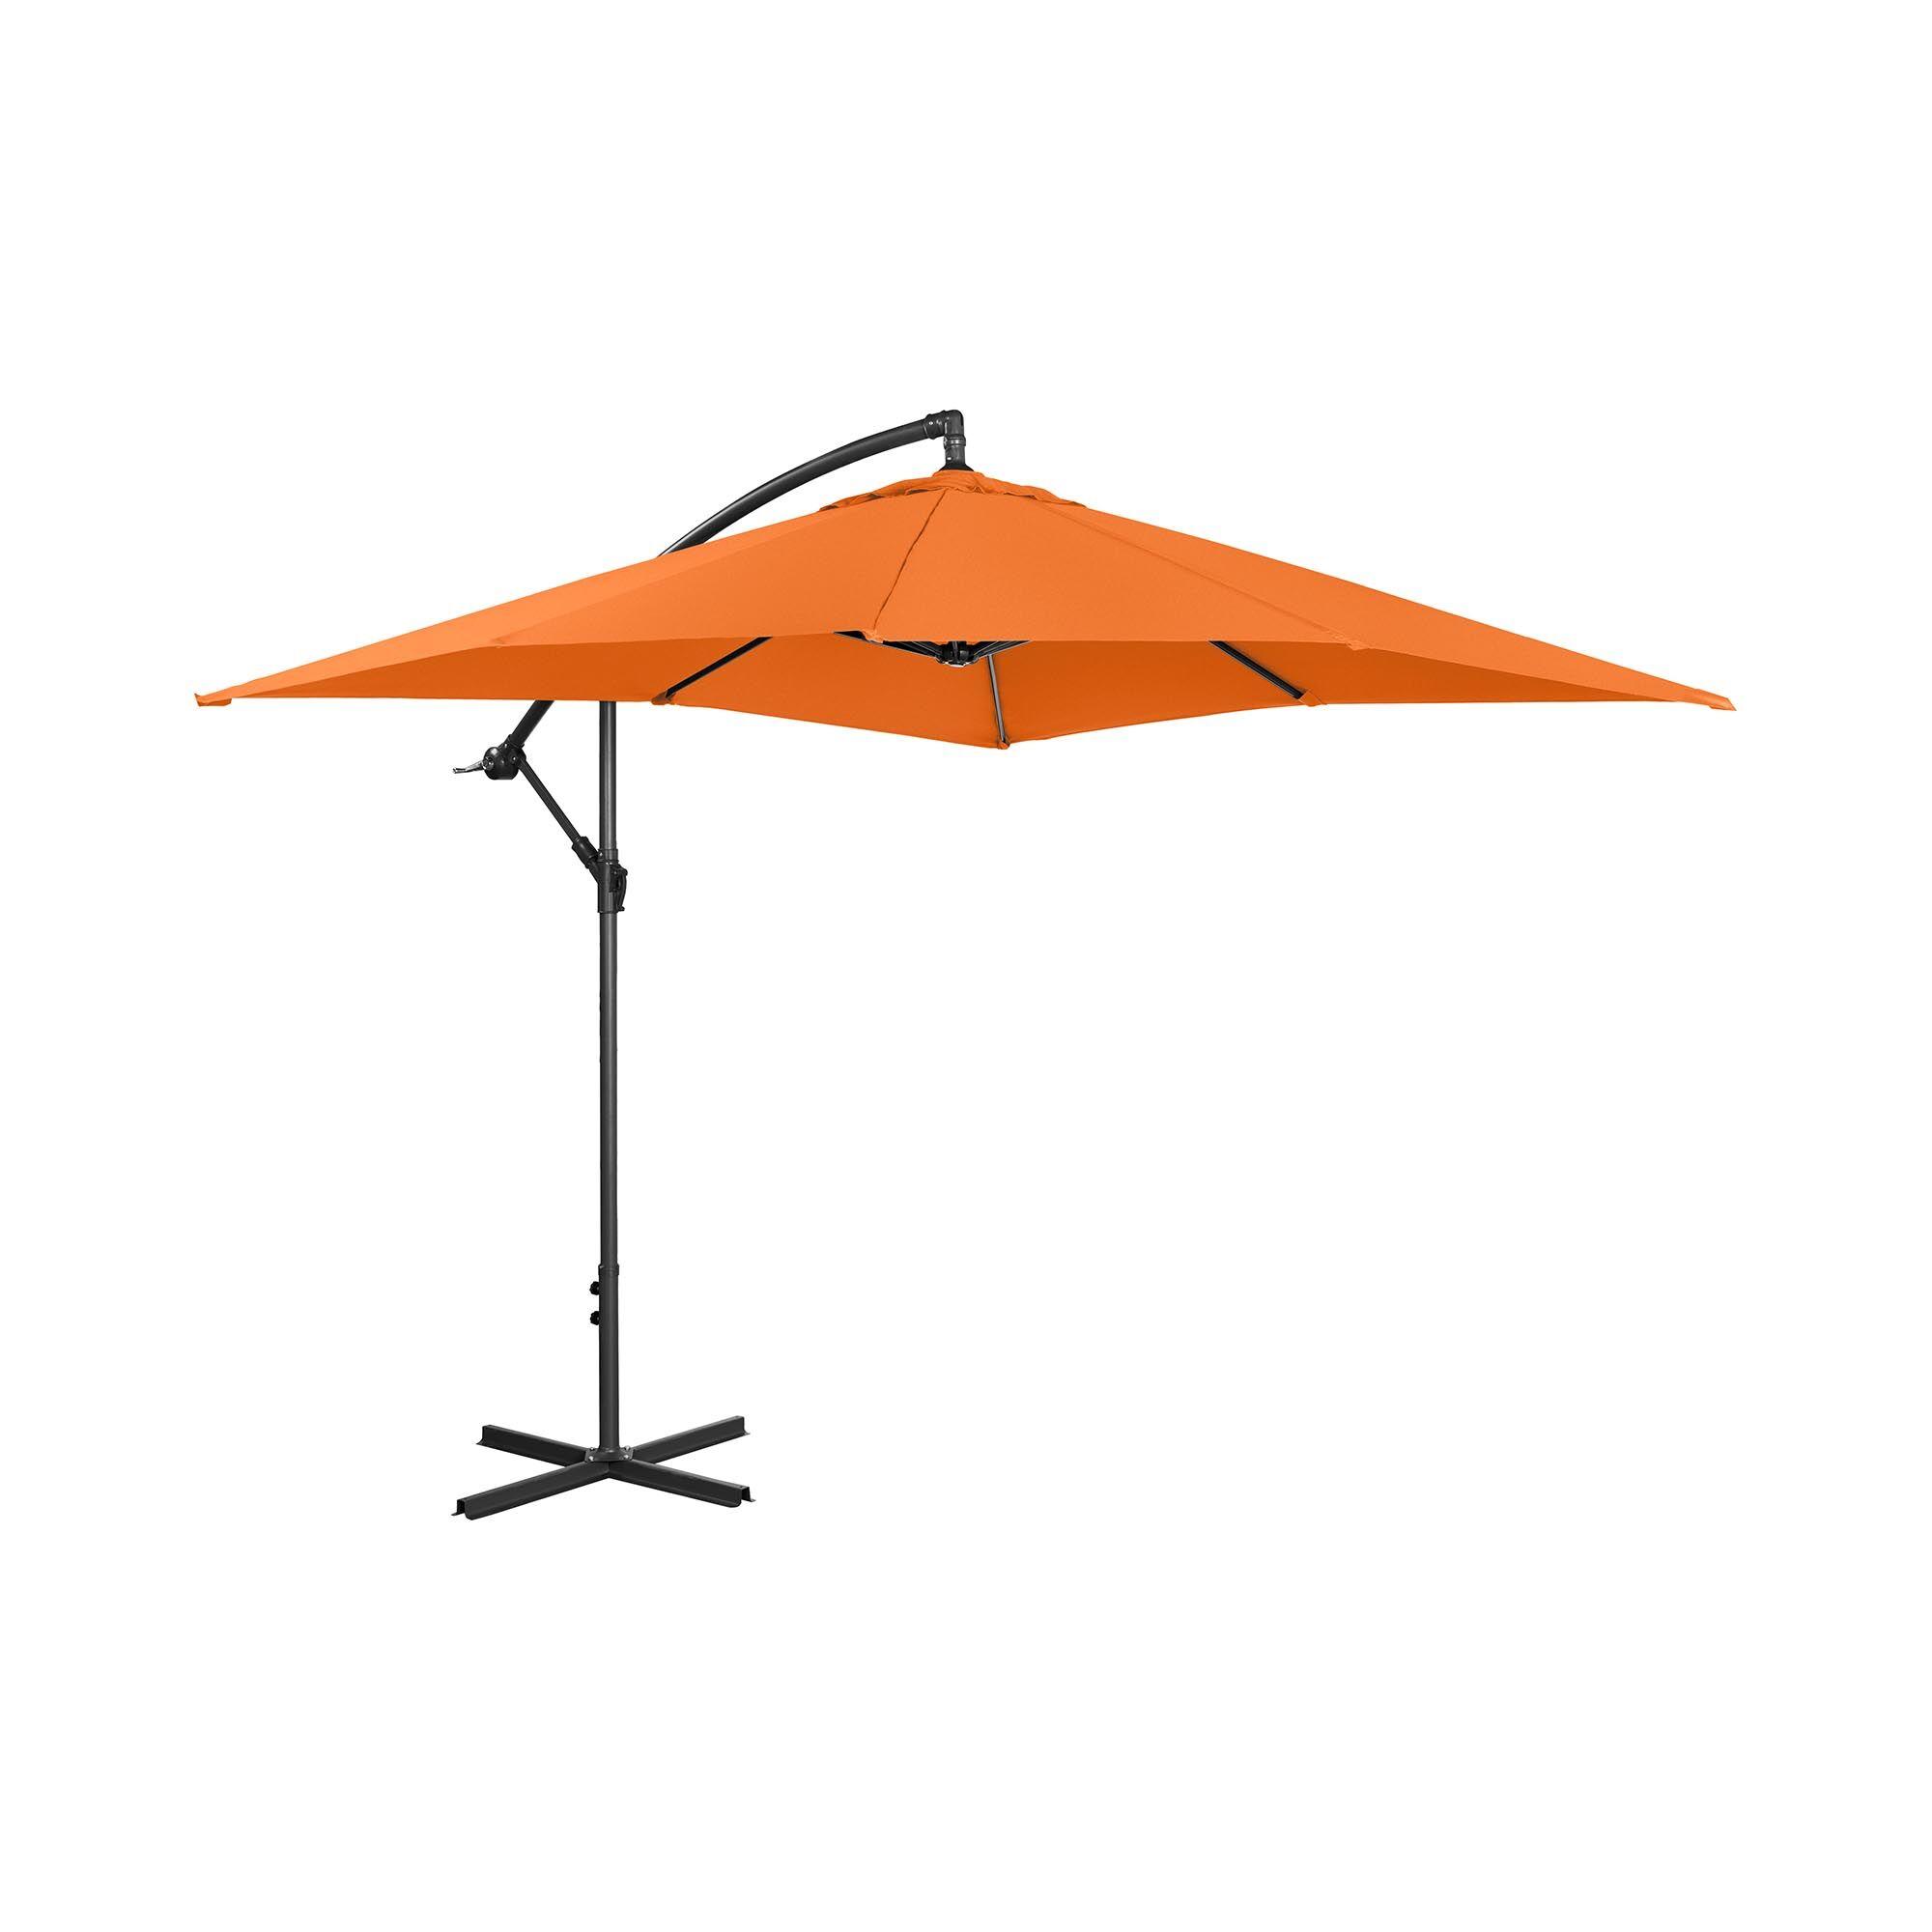 Uniprodo Hængeparasol - orange - rektangulær - 250 x 250 cm - knæk-position UNI_UMBRELLA_SQ250OR